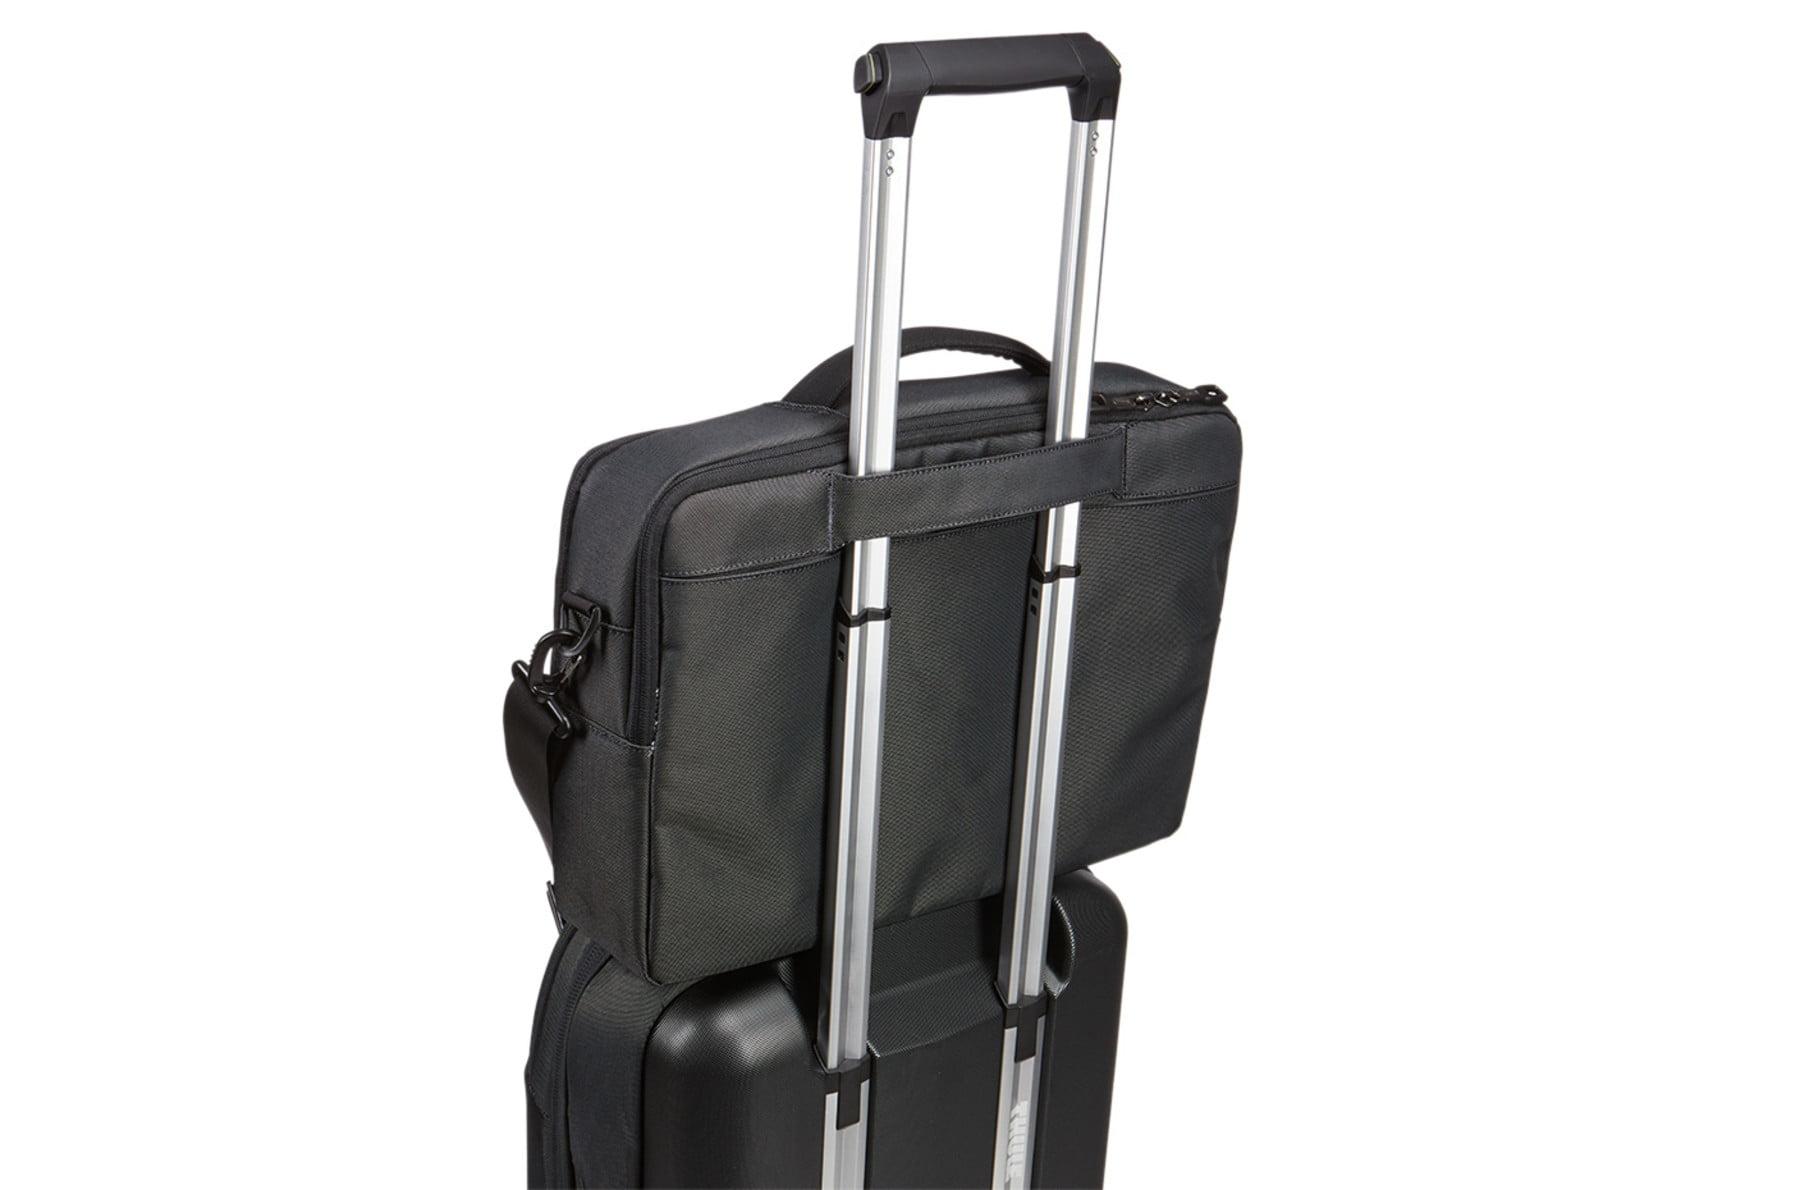 Geanta laptop Thule Subterra Laptop Bag 15.6 inchi 2